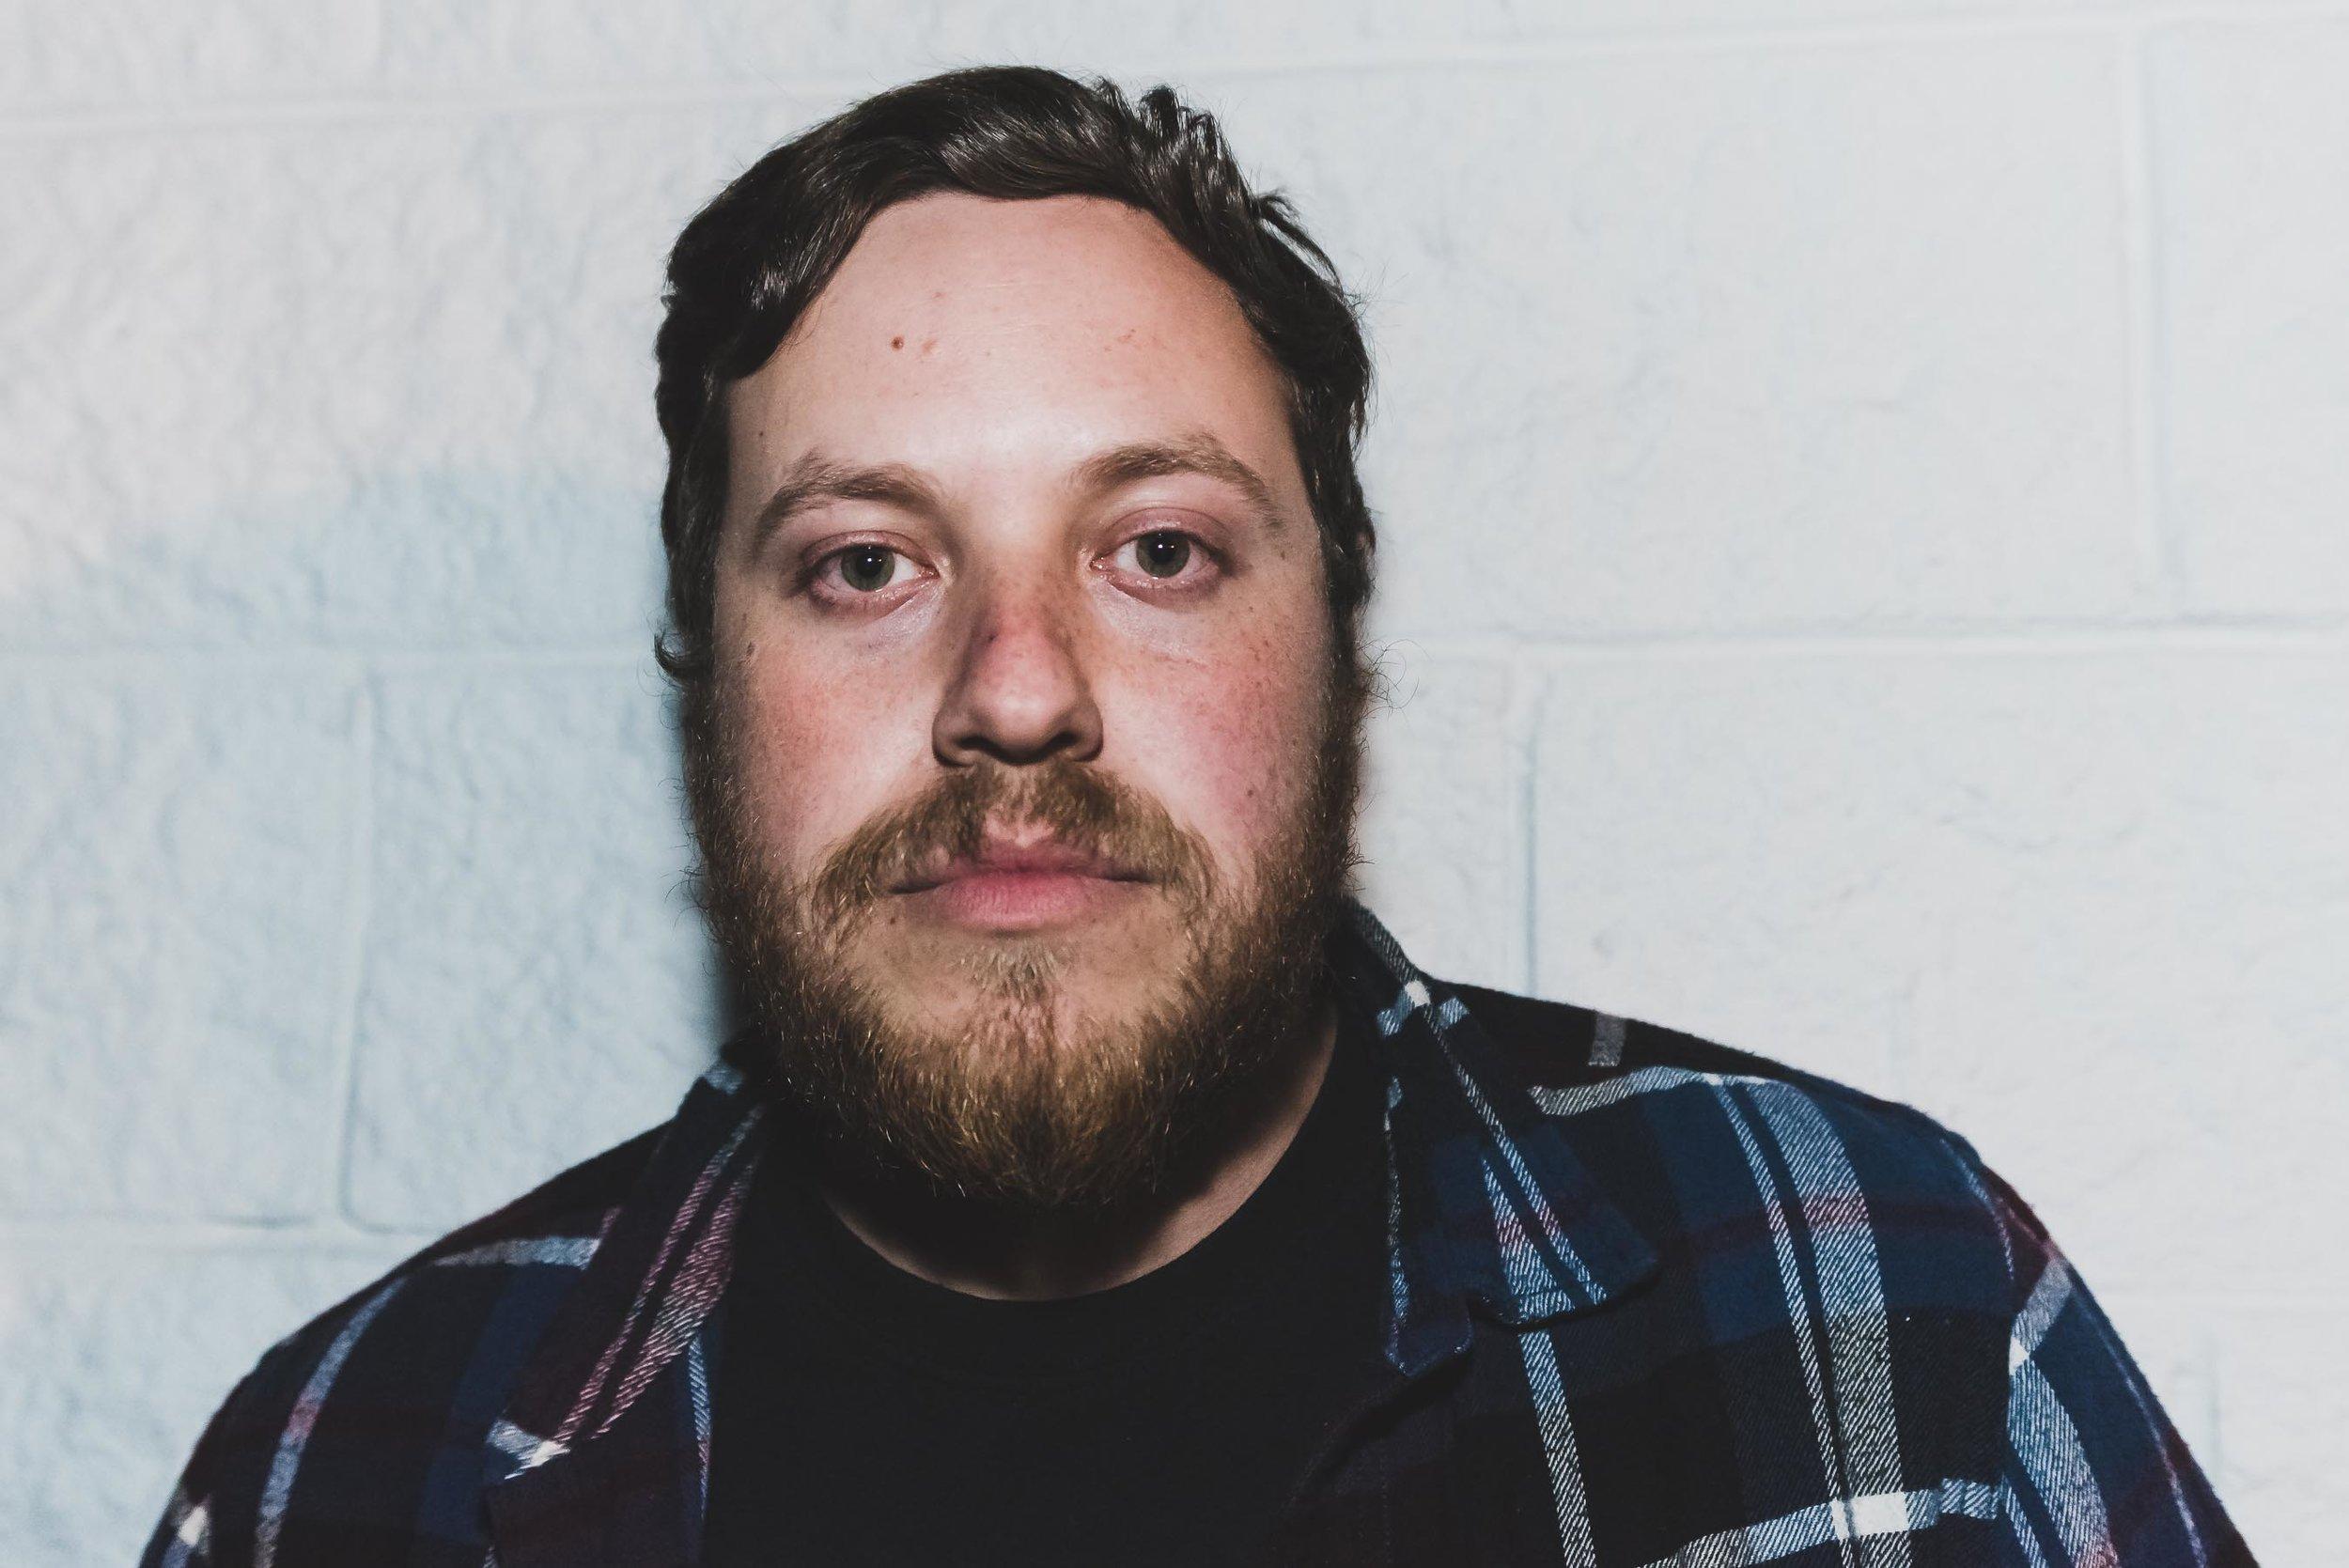 Alex Tucker of Dead Leaves / 11/13/15 / Shakers Pub / Oakdale, N.Y.